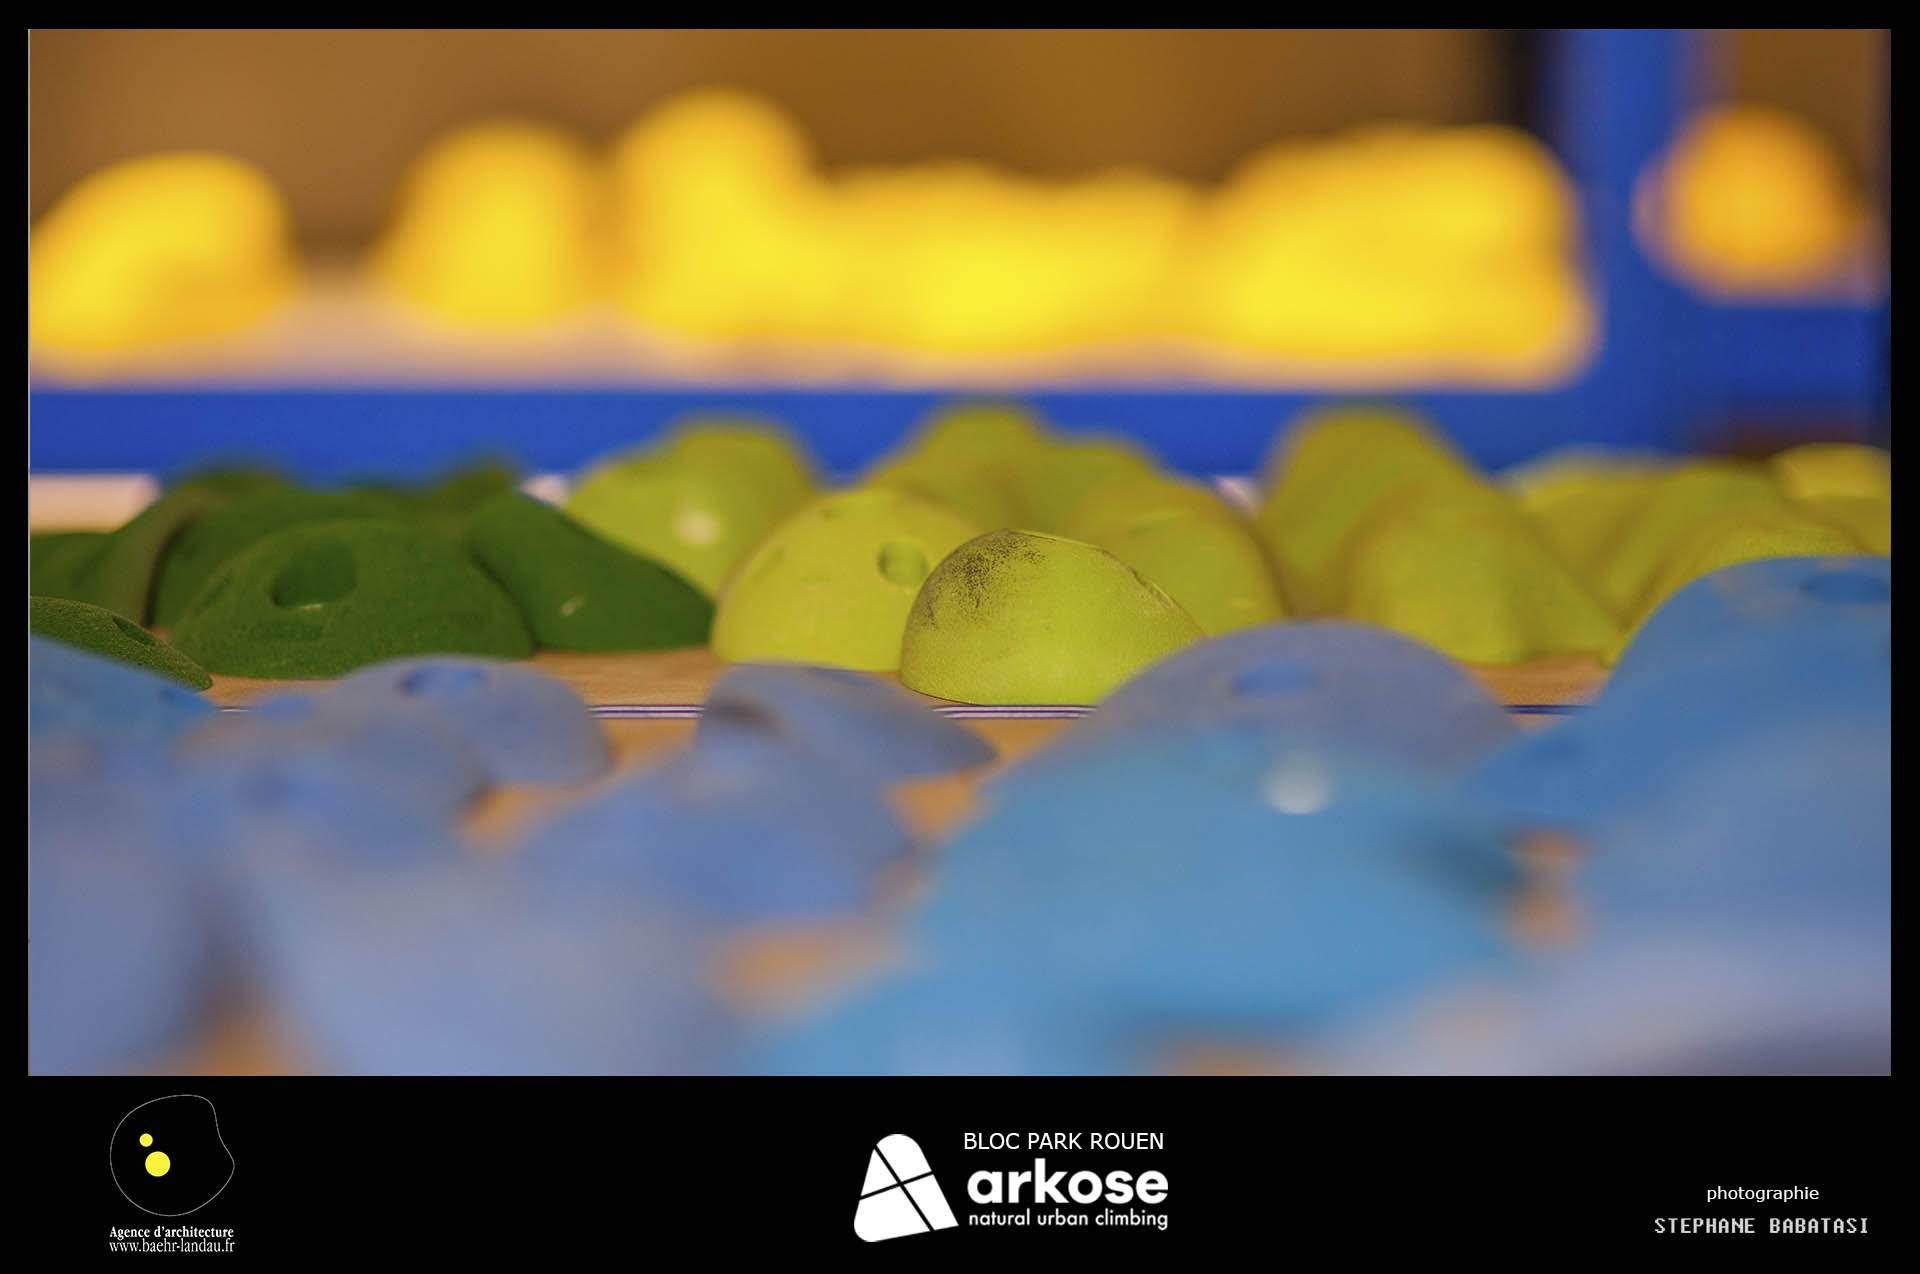 ARKOSE_ROUEN_photoSB-44